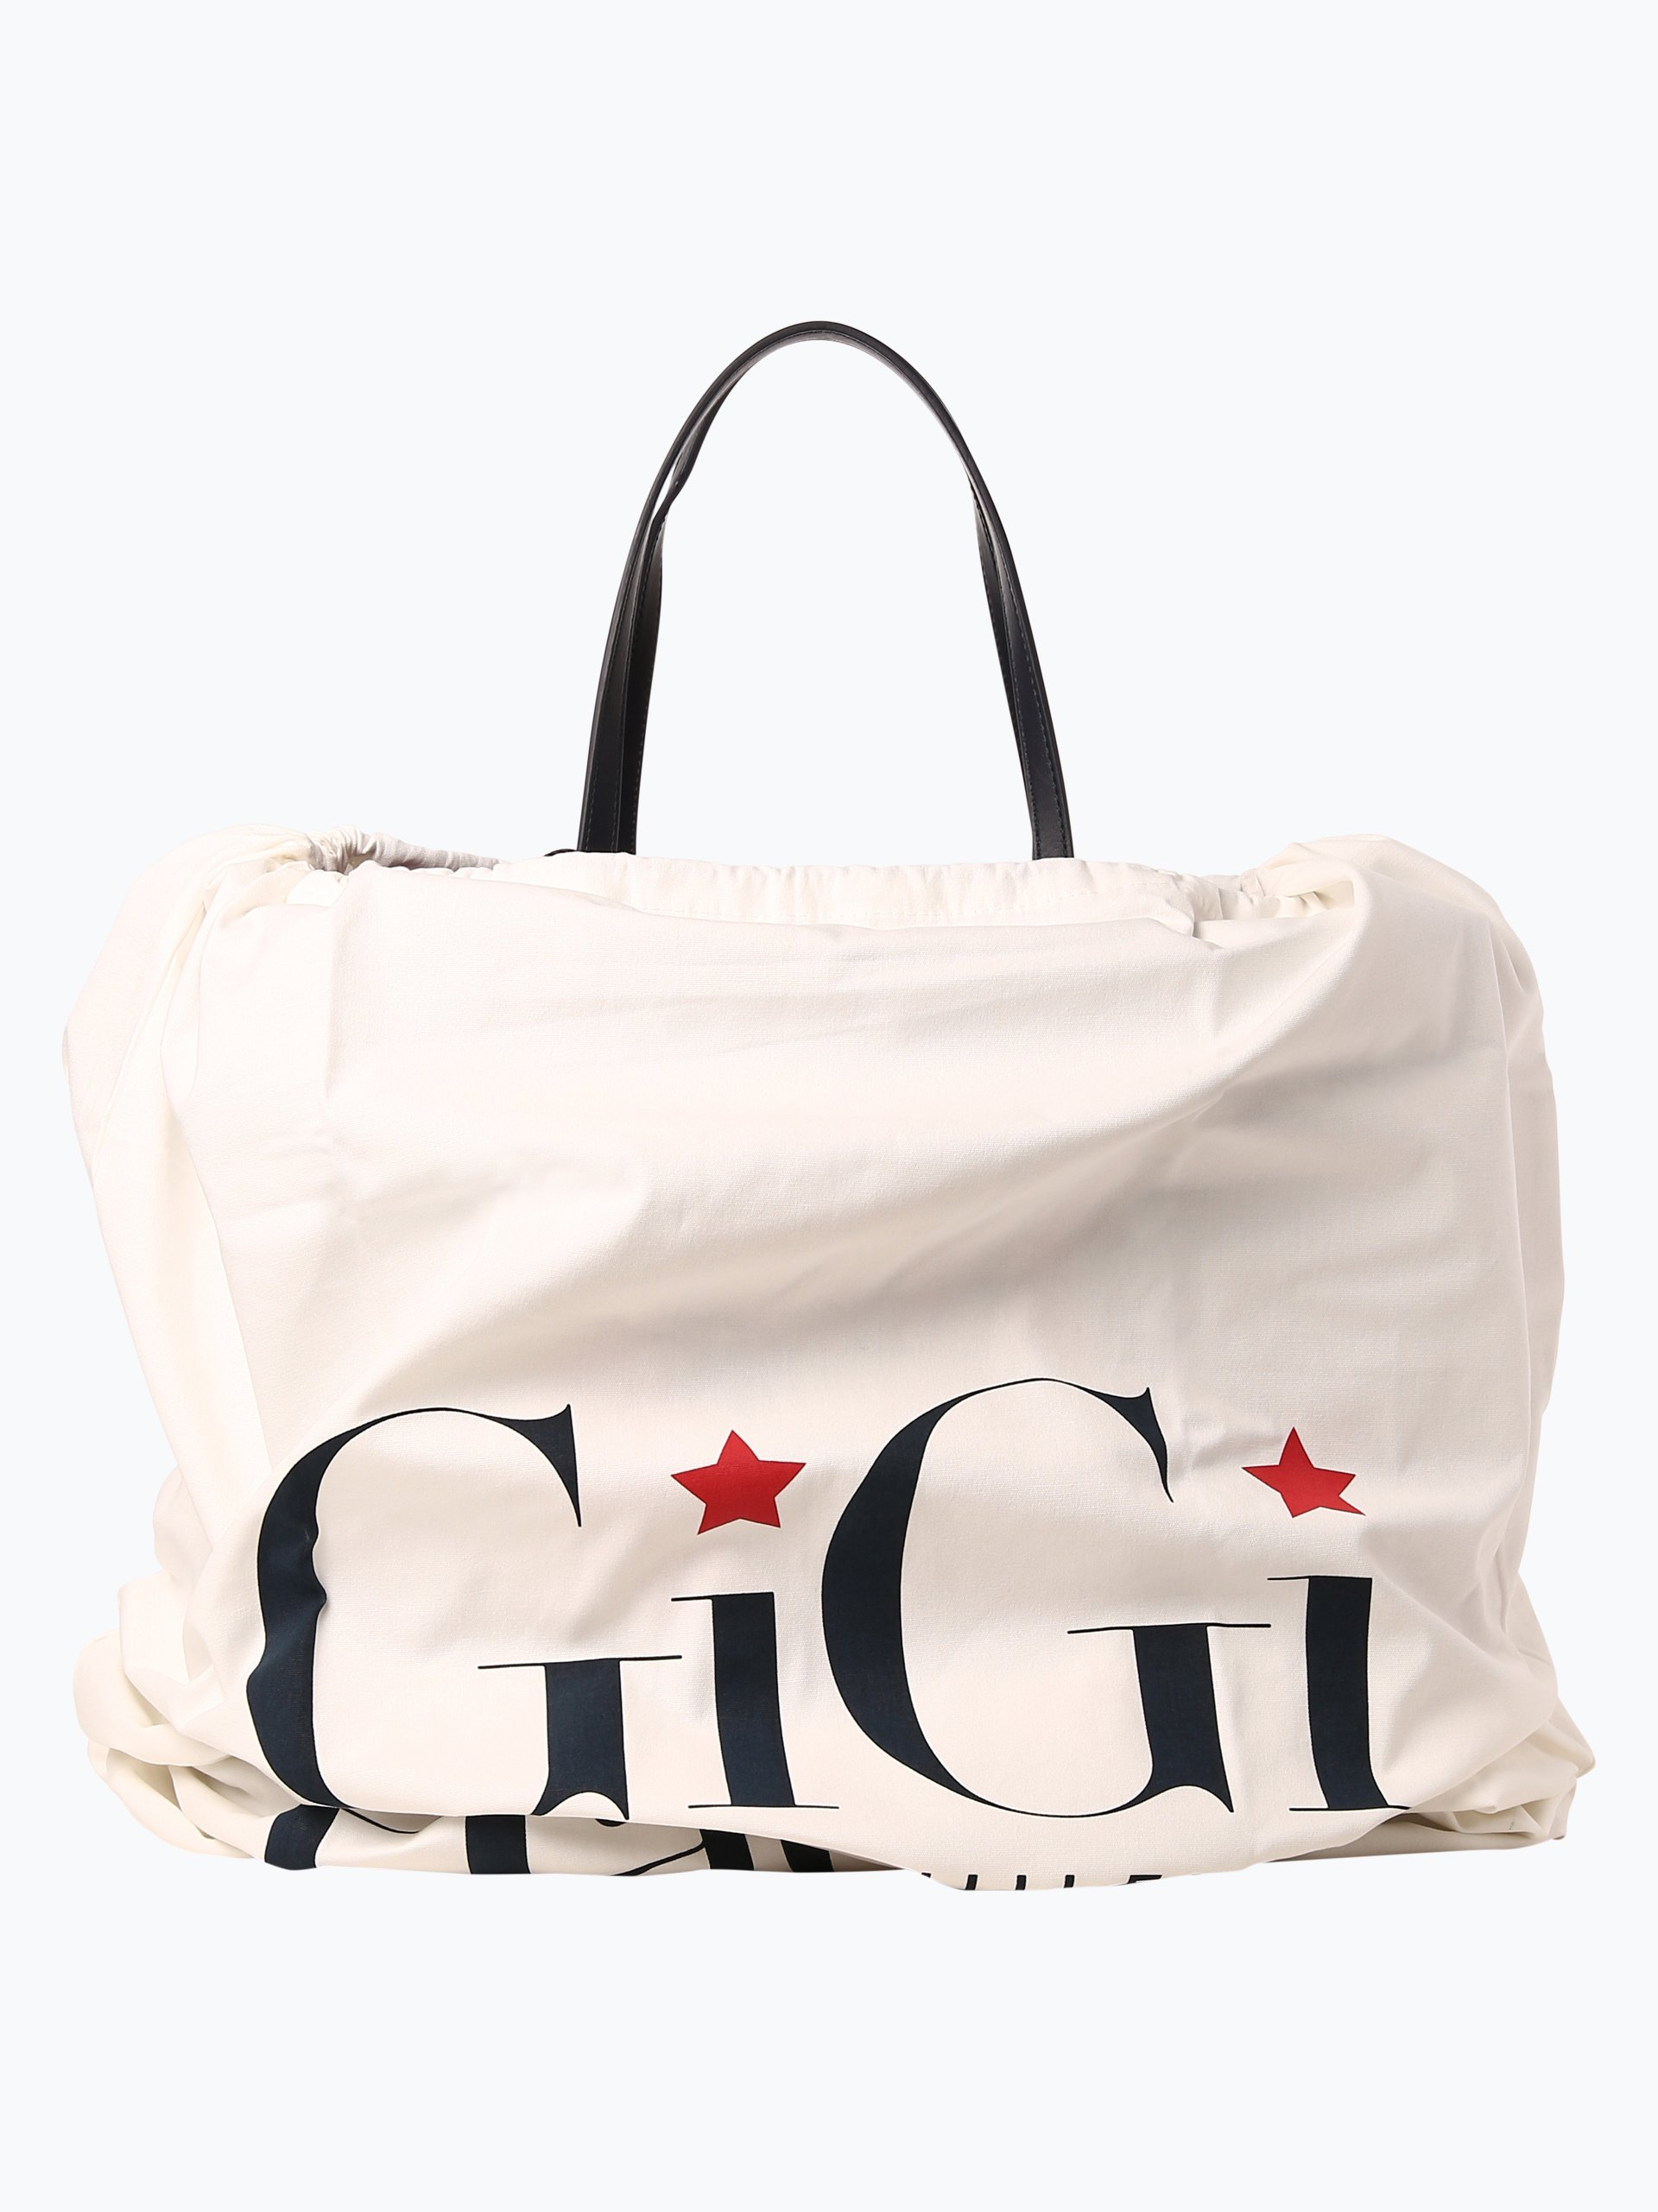 89be7522229e0 Tommy Hilfiger Damska torba shopper – Gigi Hadid Tote kup online ...